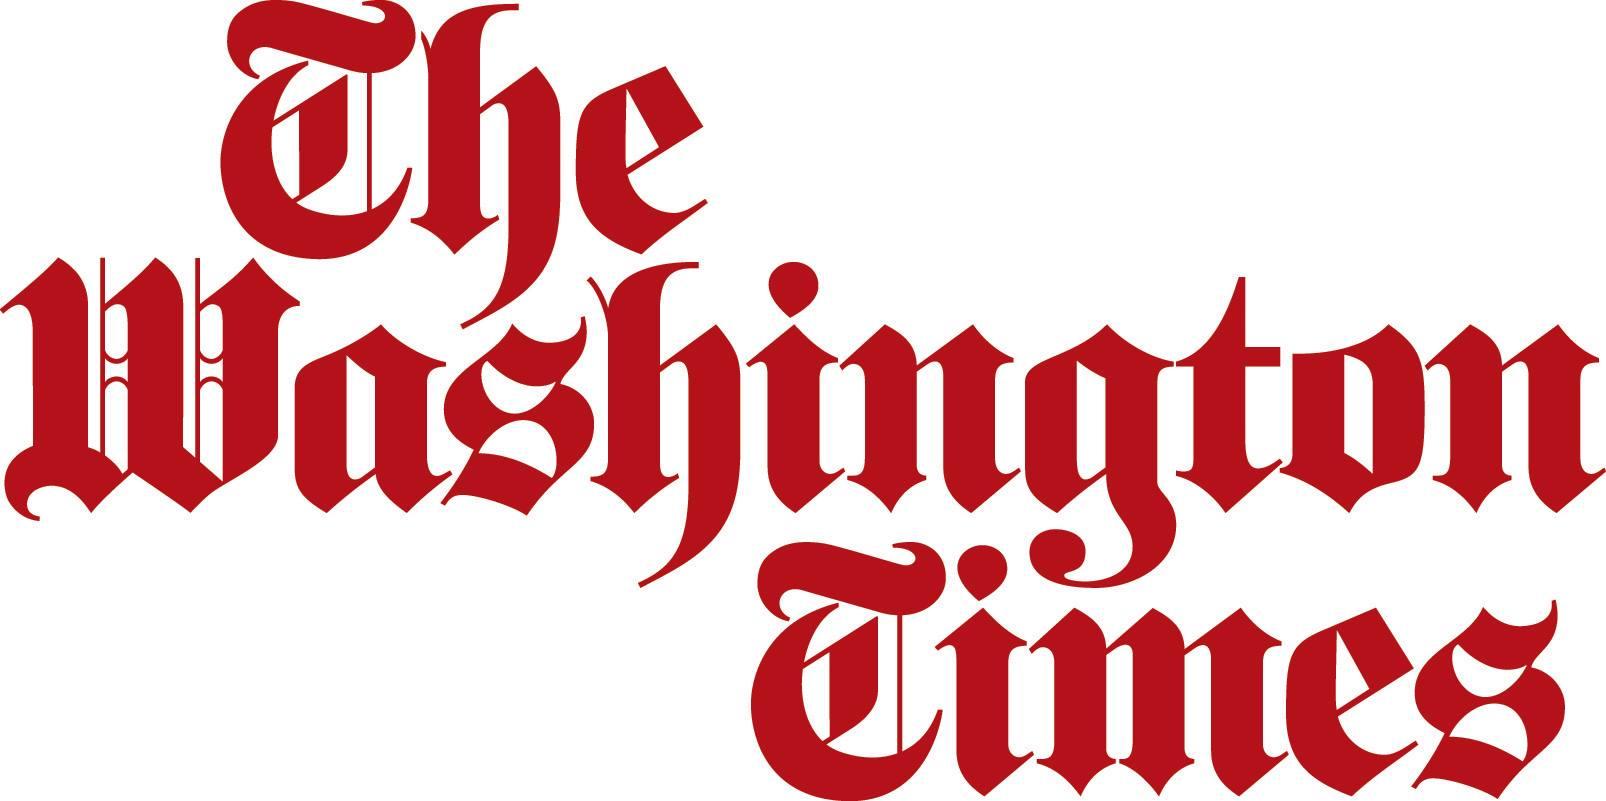 washington times.jpg